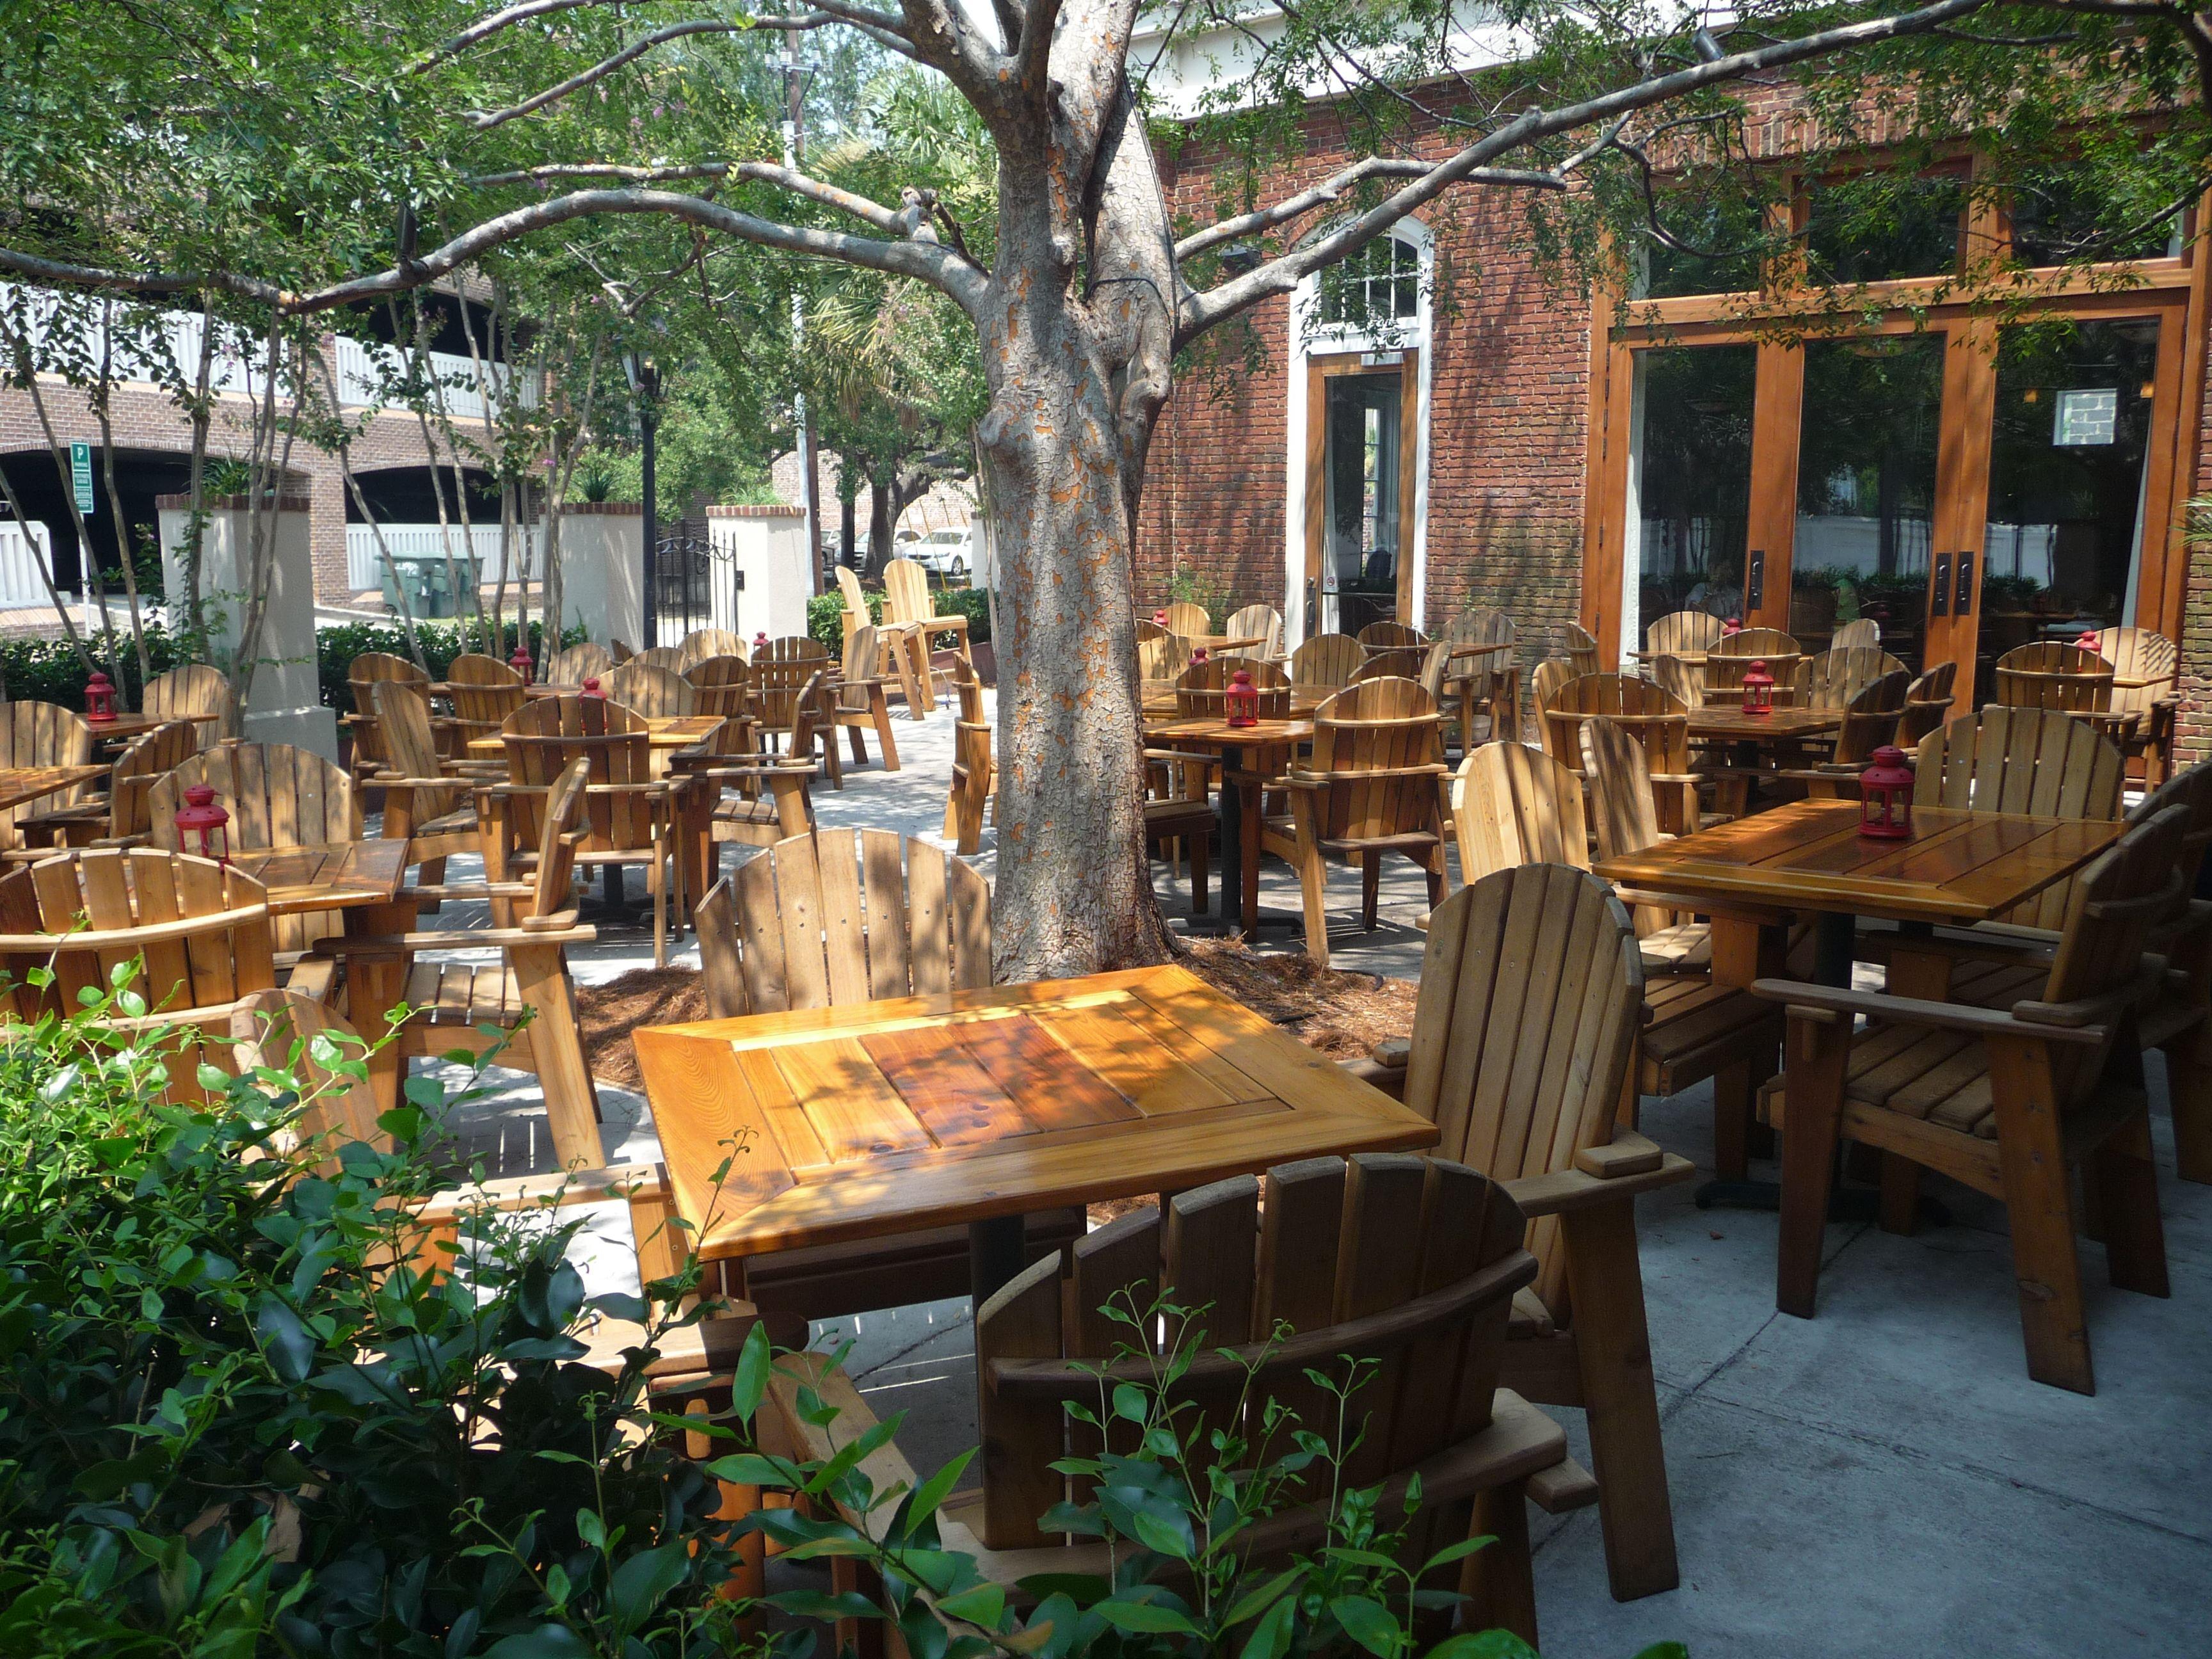 Best outdoor dining in charleston